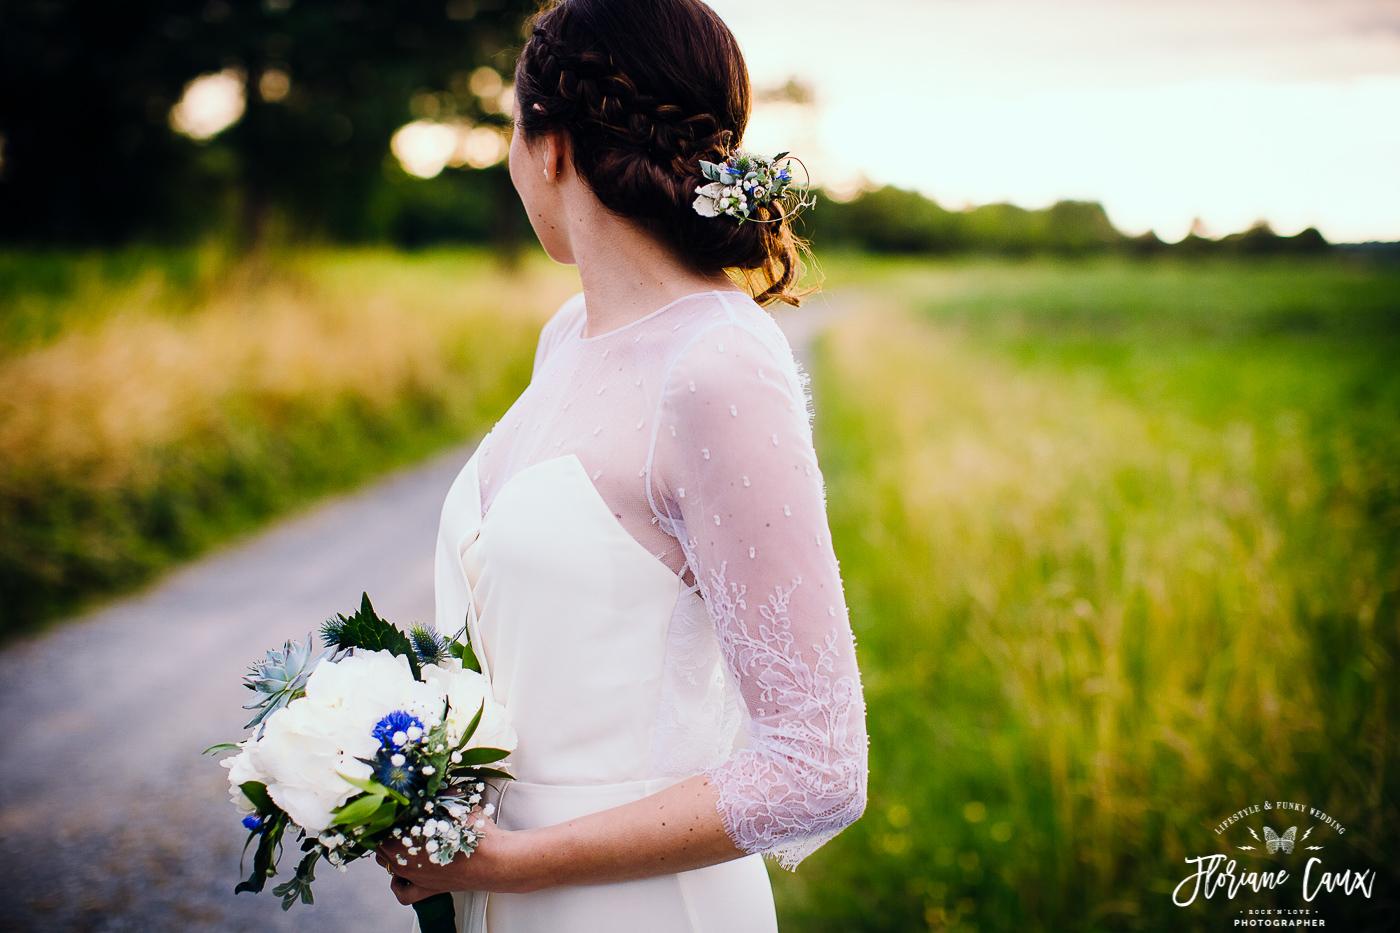 photographe-mariage-pays-basque-Floriane-Caux (58)